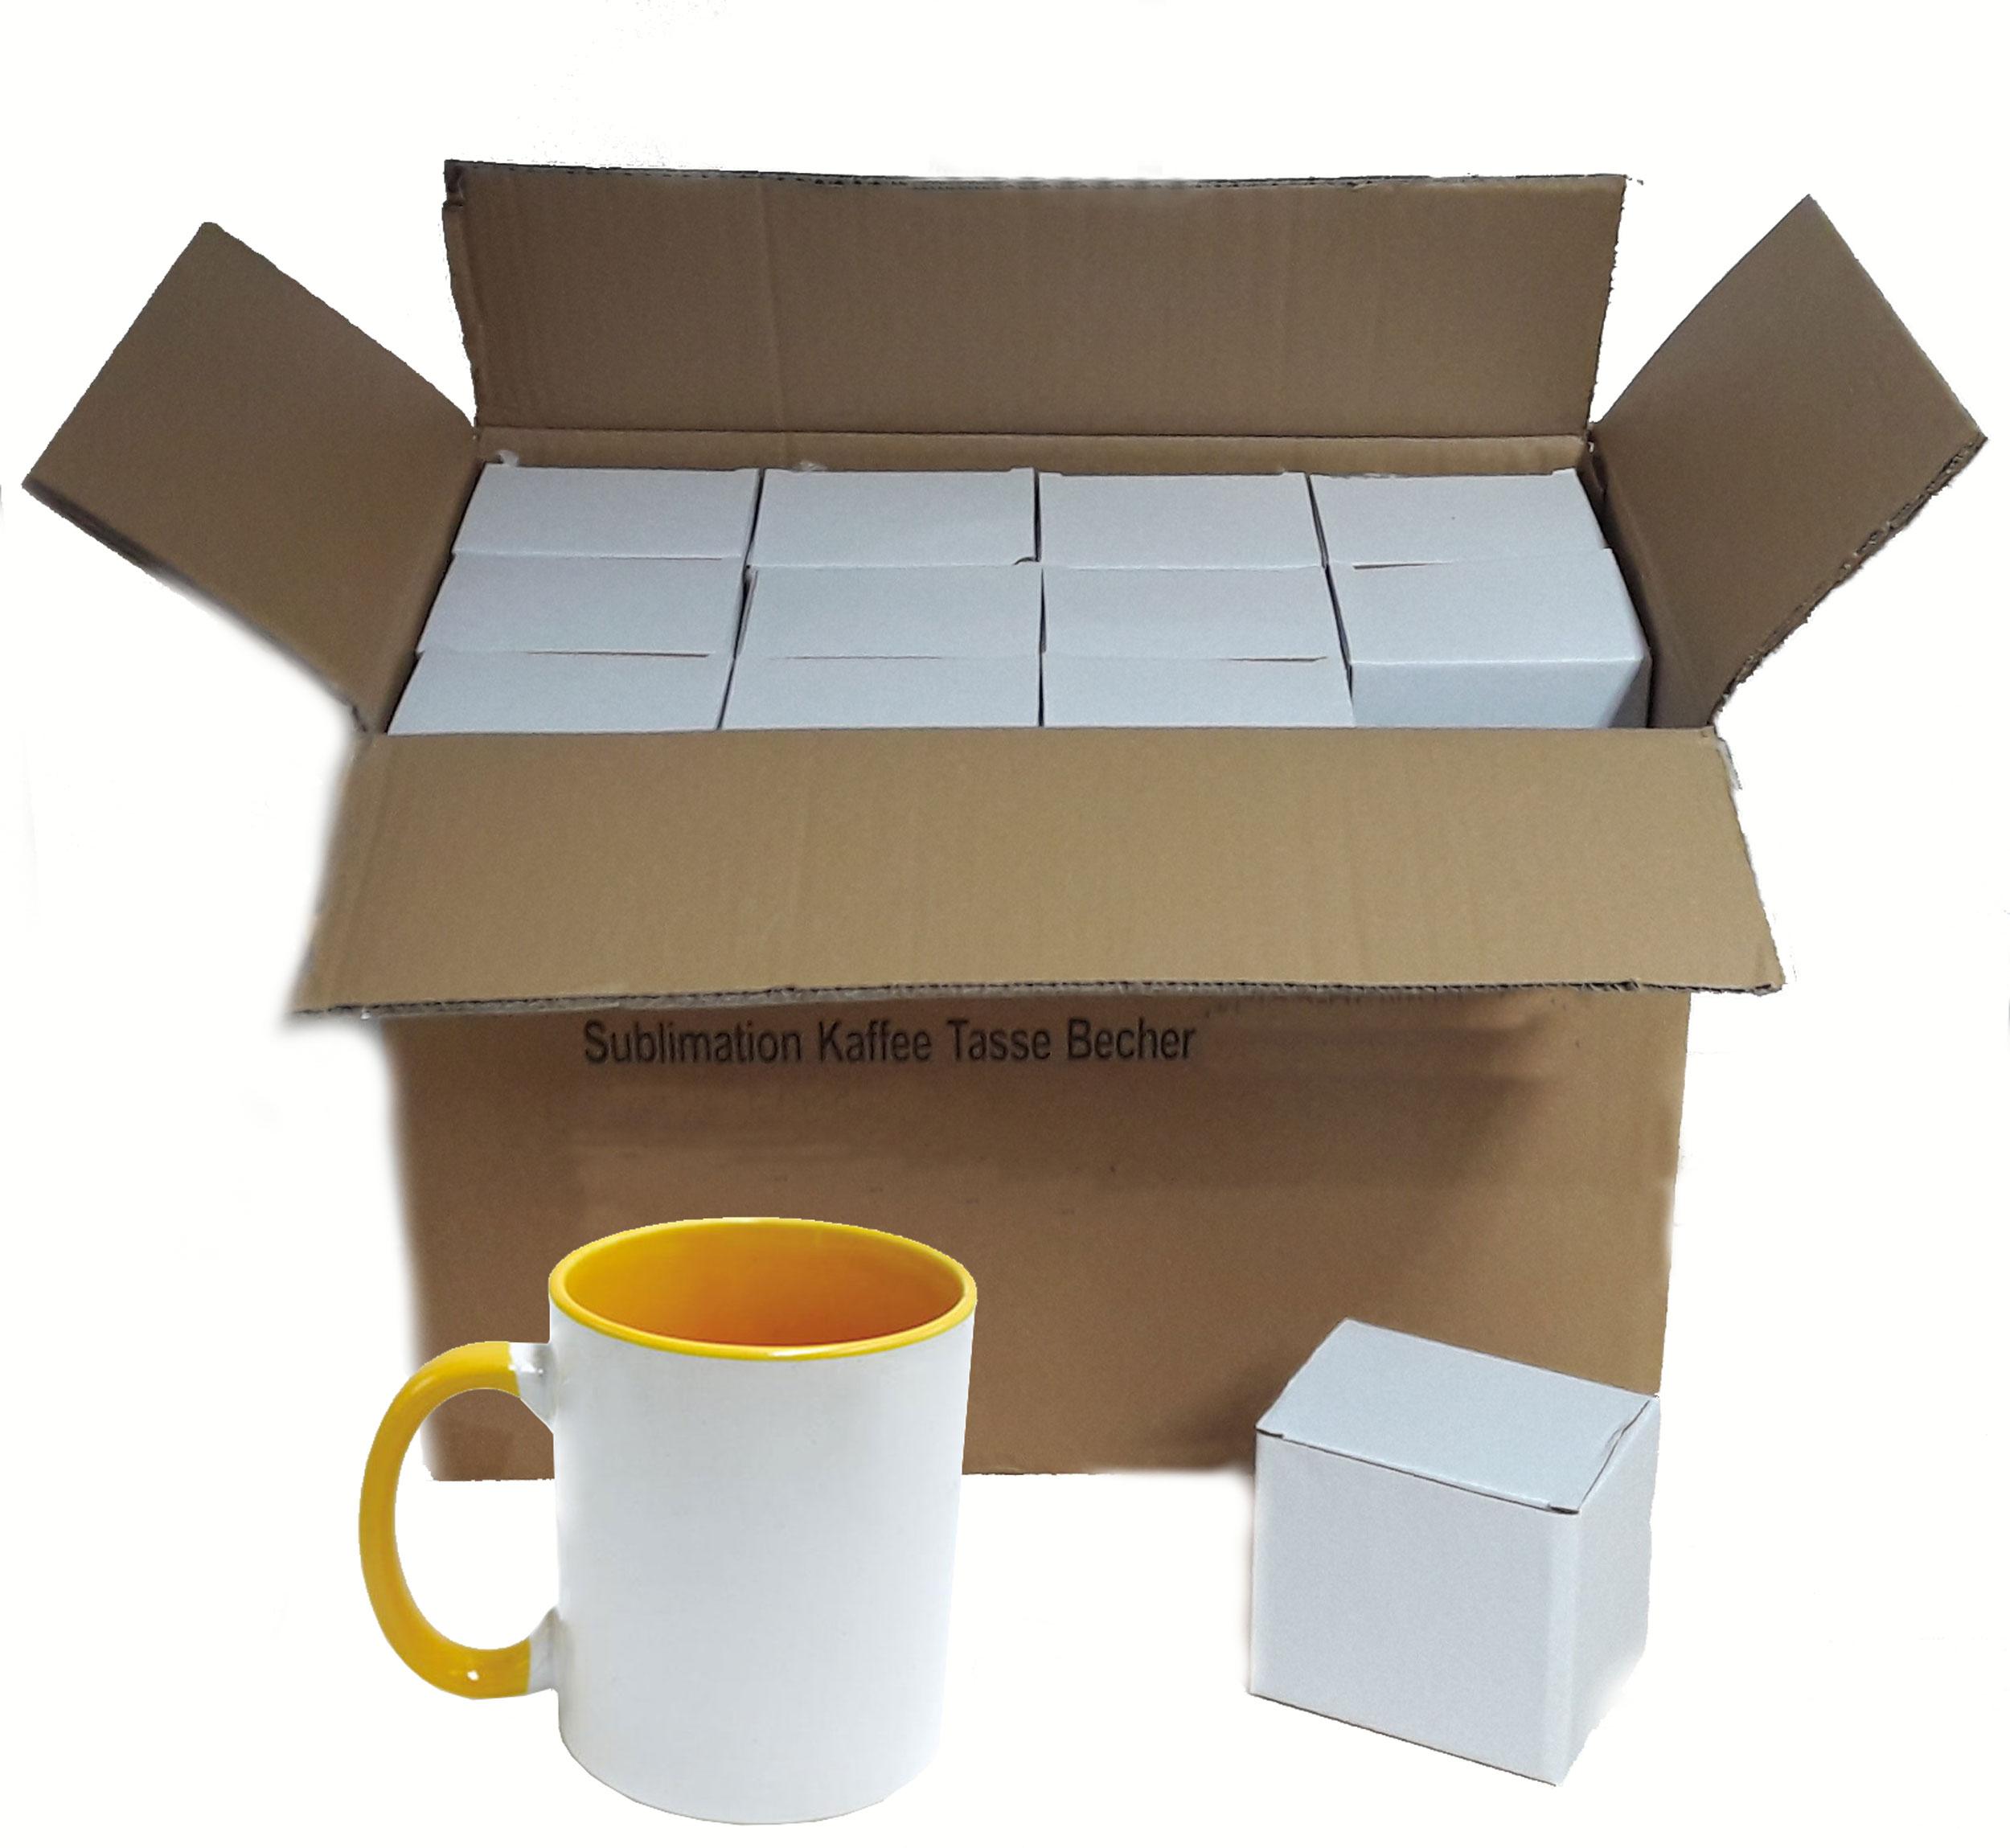 36 Stück Fototasse Sublimation Kaffee Tassen Becher WEISS - HENKEL Gelb